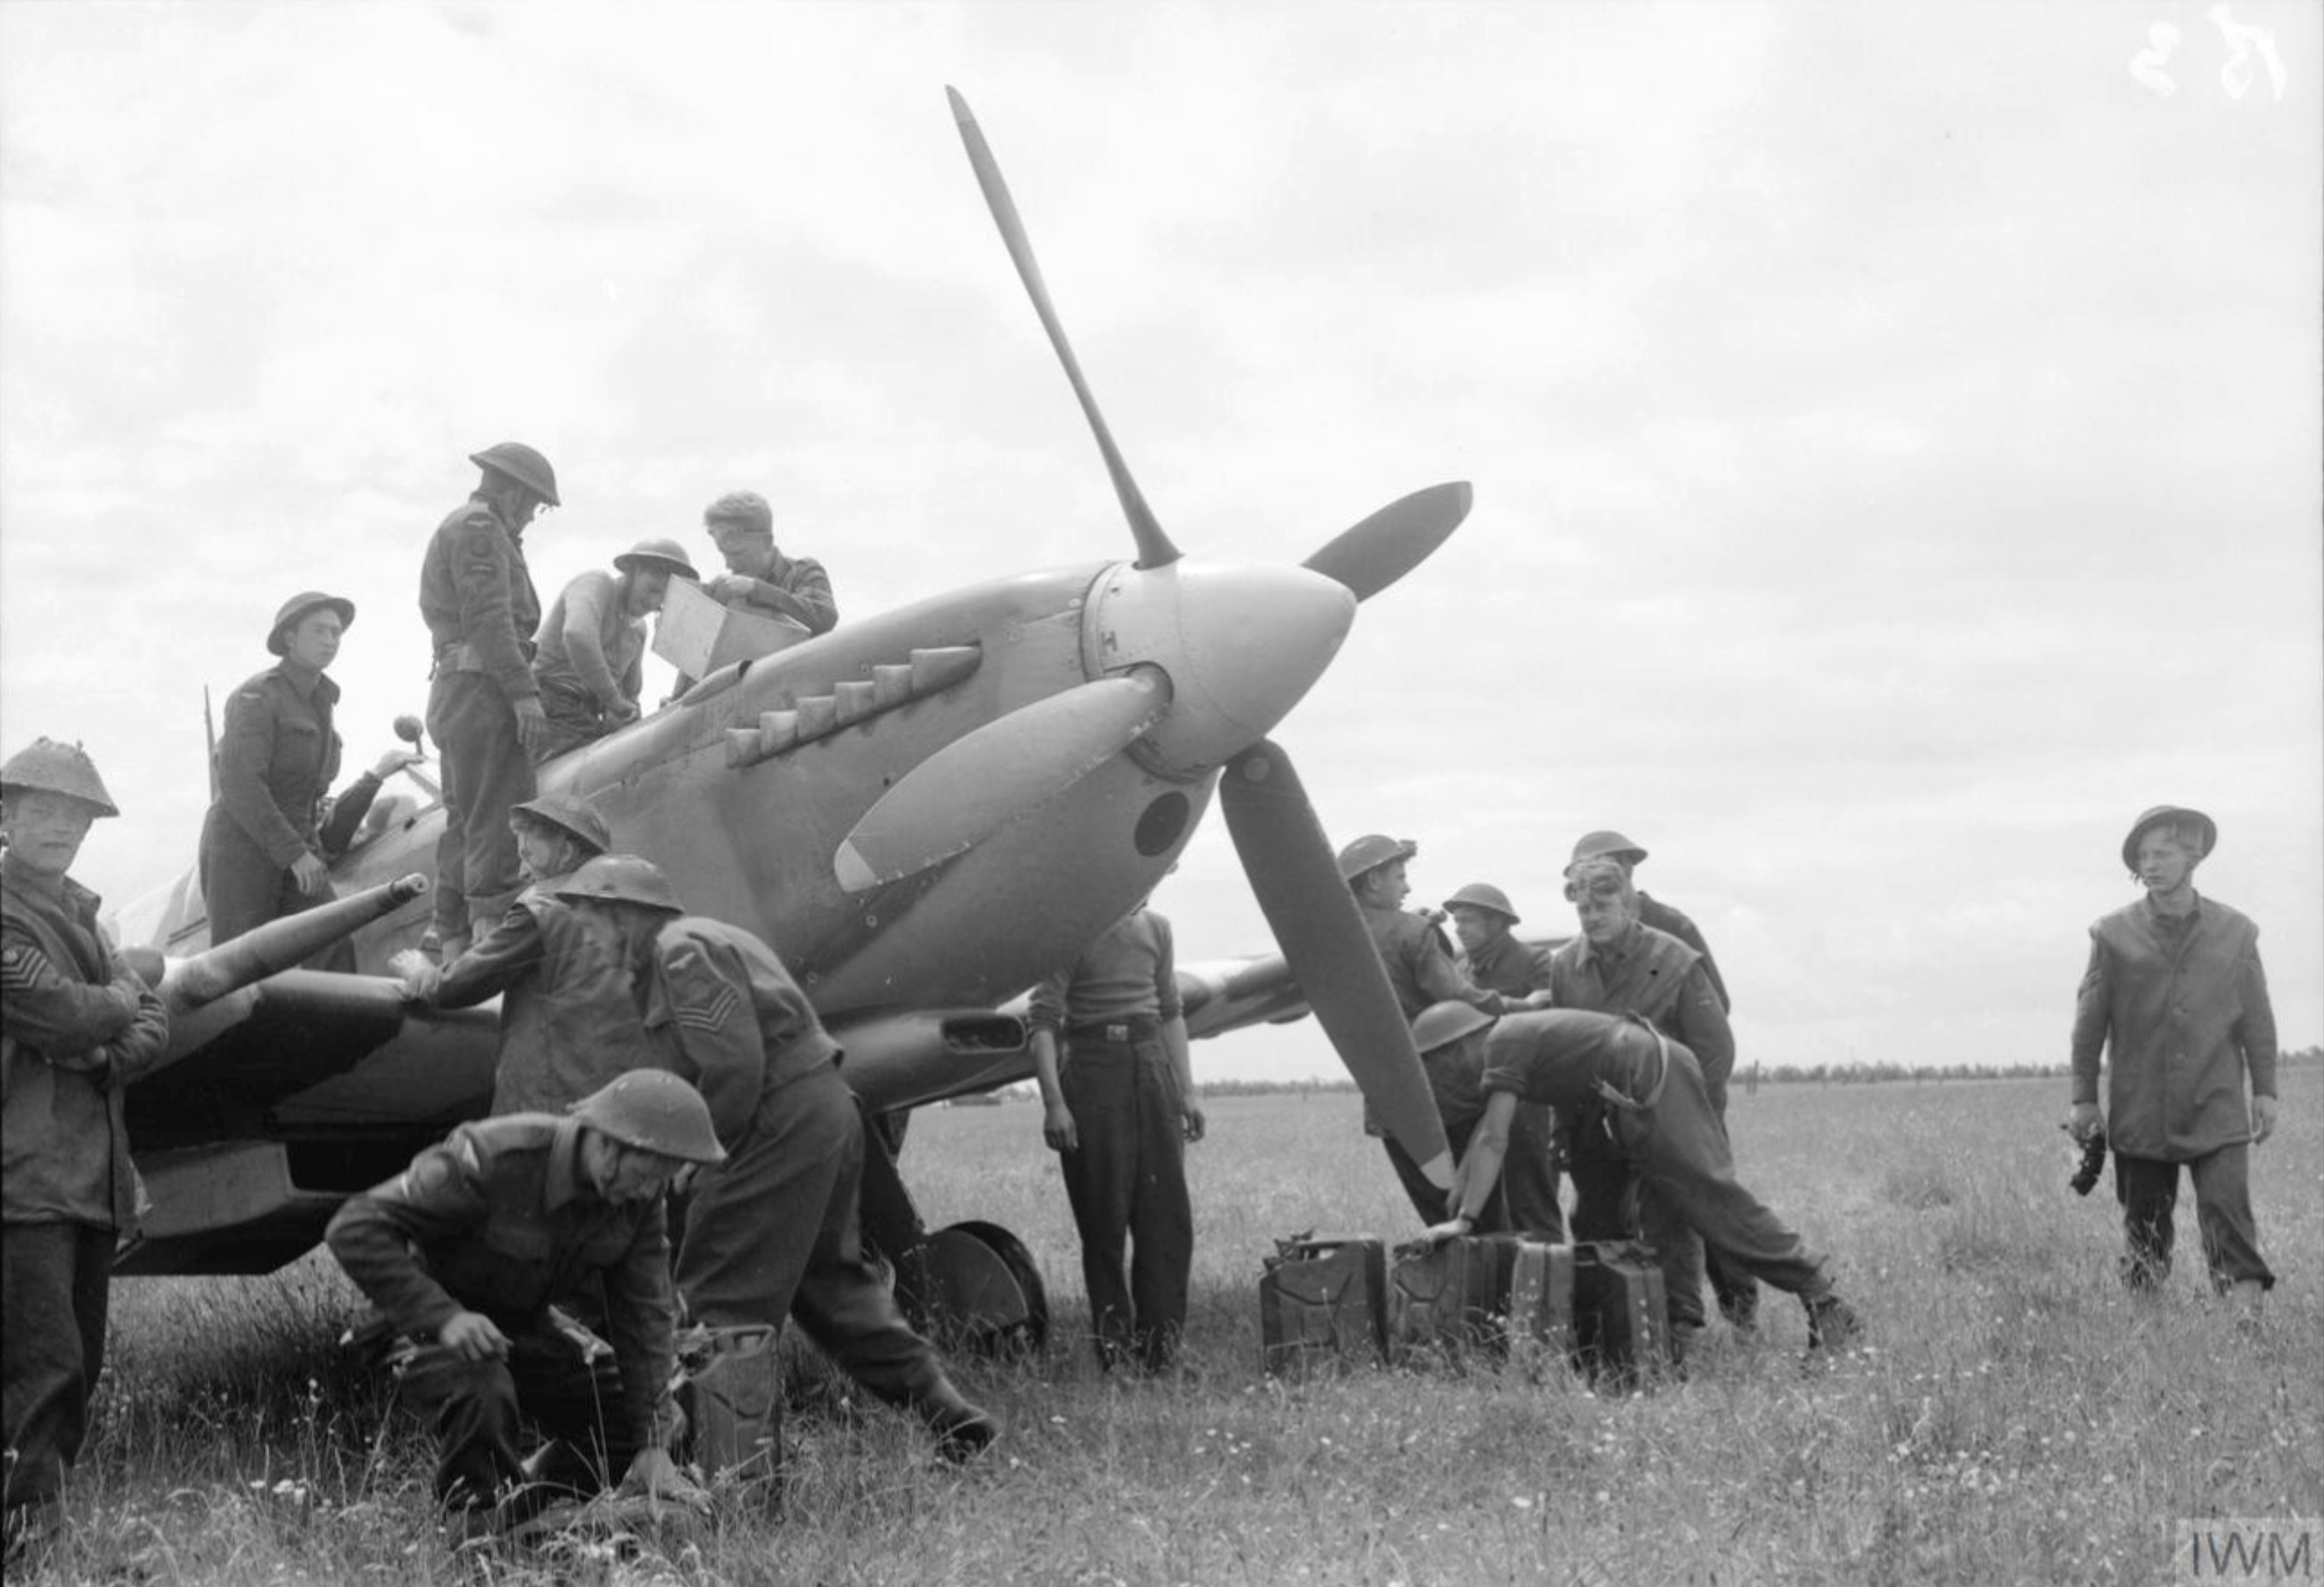 Spitfire MkIX RCAF 441Sqn at B3 Sainte Croix sur Mer Normandy 10 Jun 1944 IWM CL76